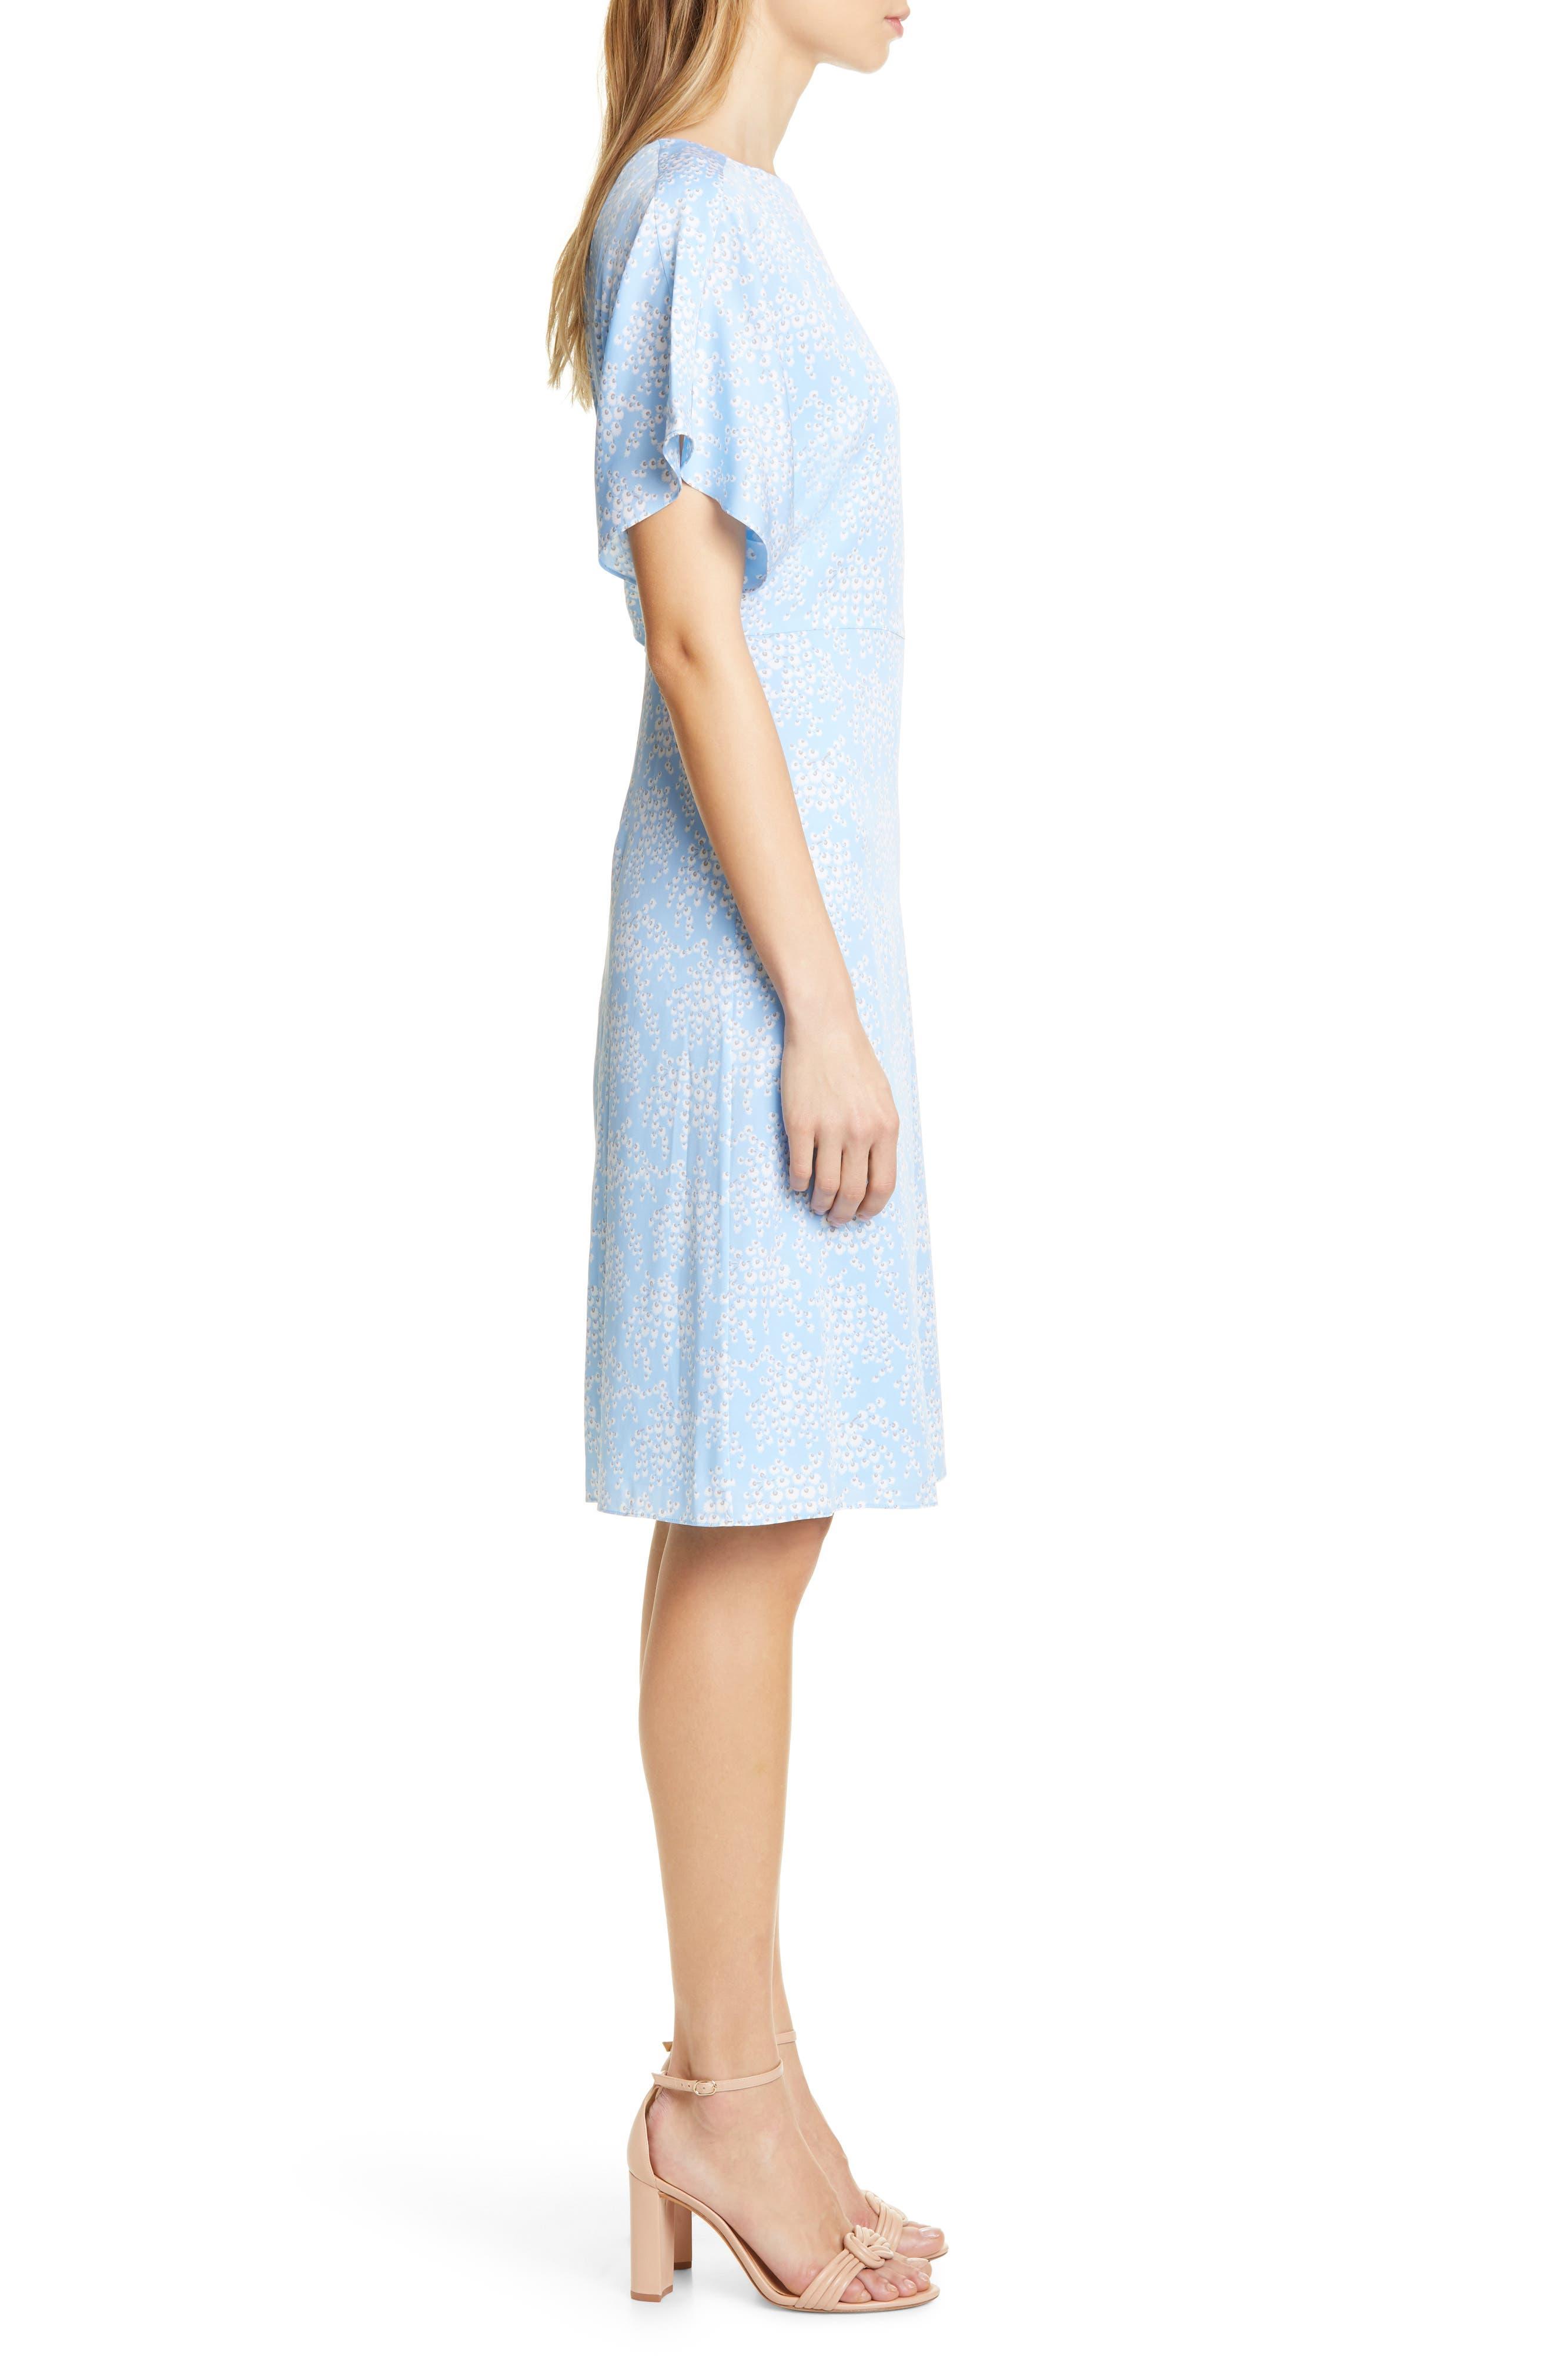 LEWIT, Kimono Sleeve Stretch Silk Dress, Alternate thumbnail 4, color, BLUE SIDDAL FLORAL